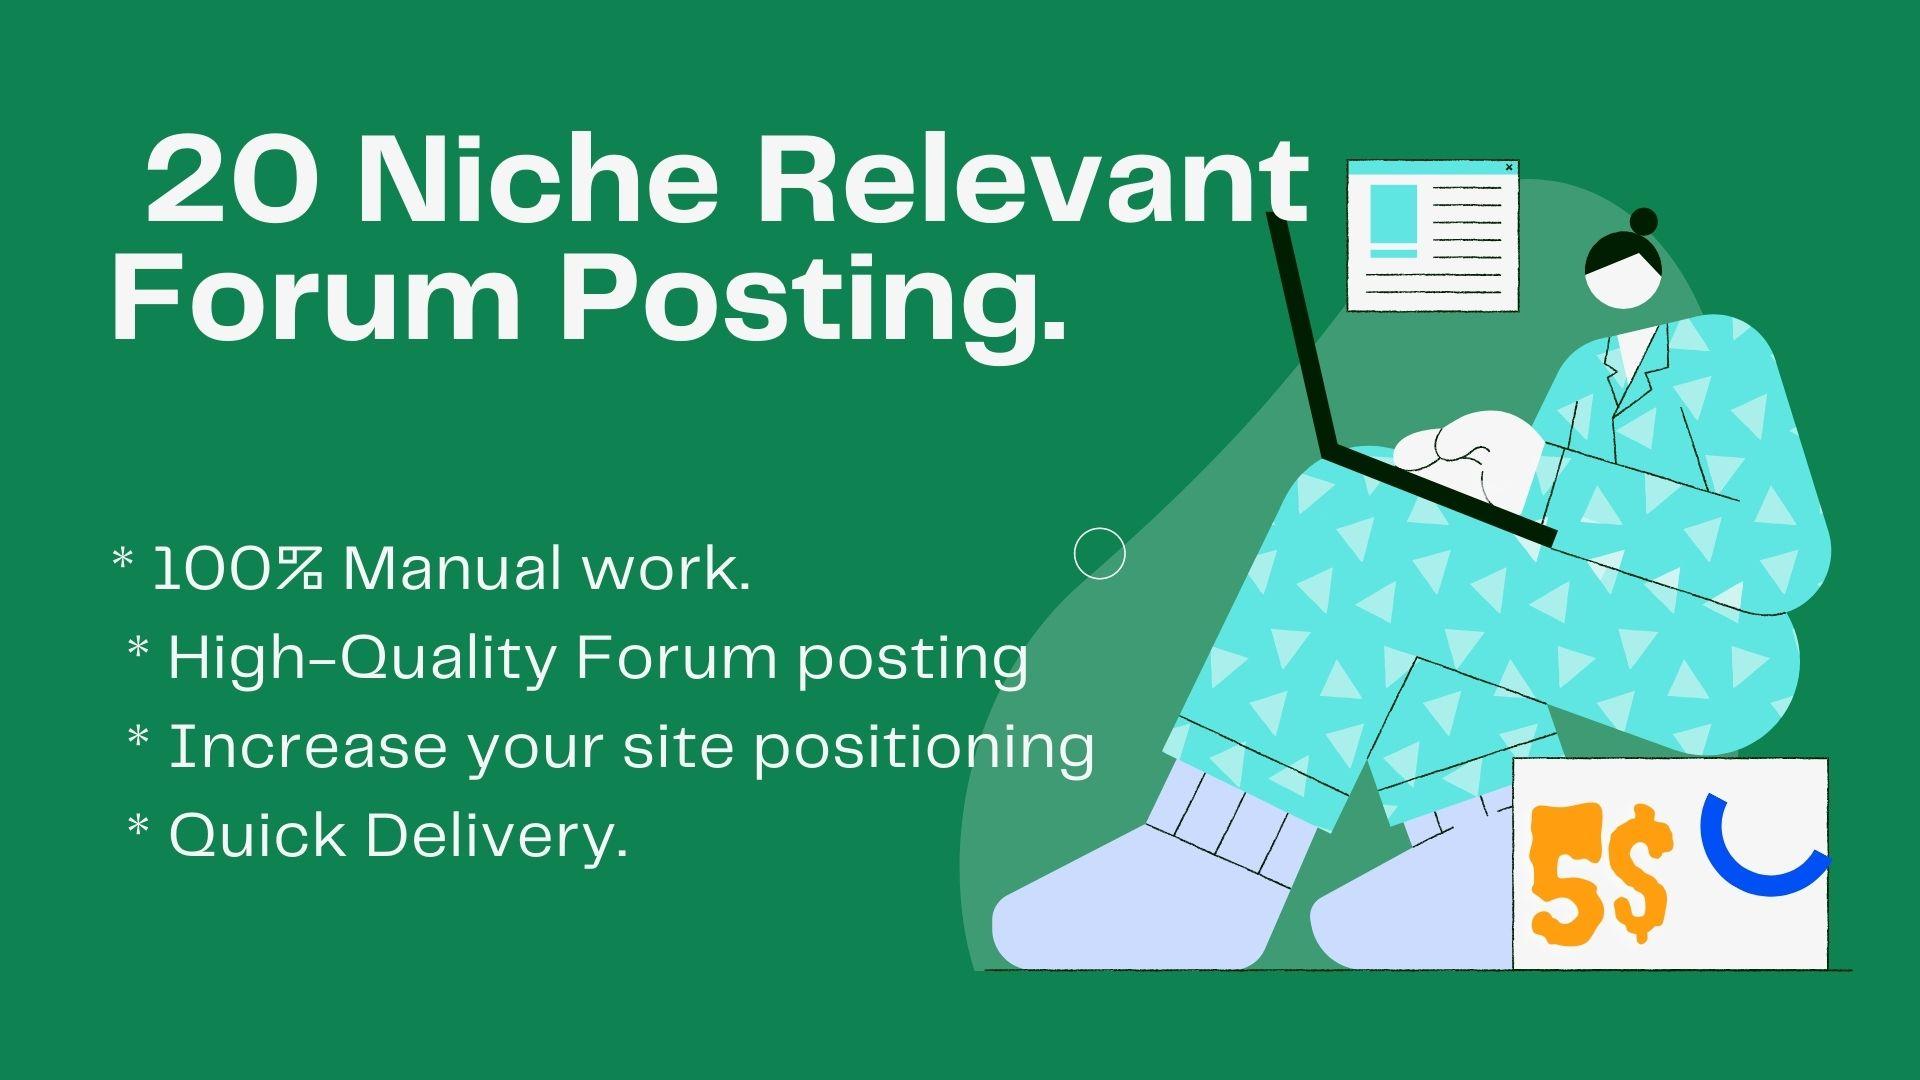 provide you niche relevant 20 forum posting.